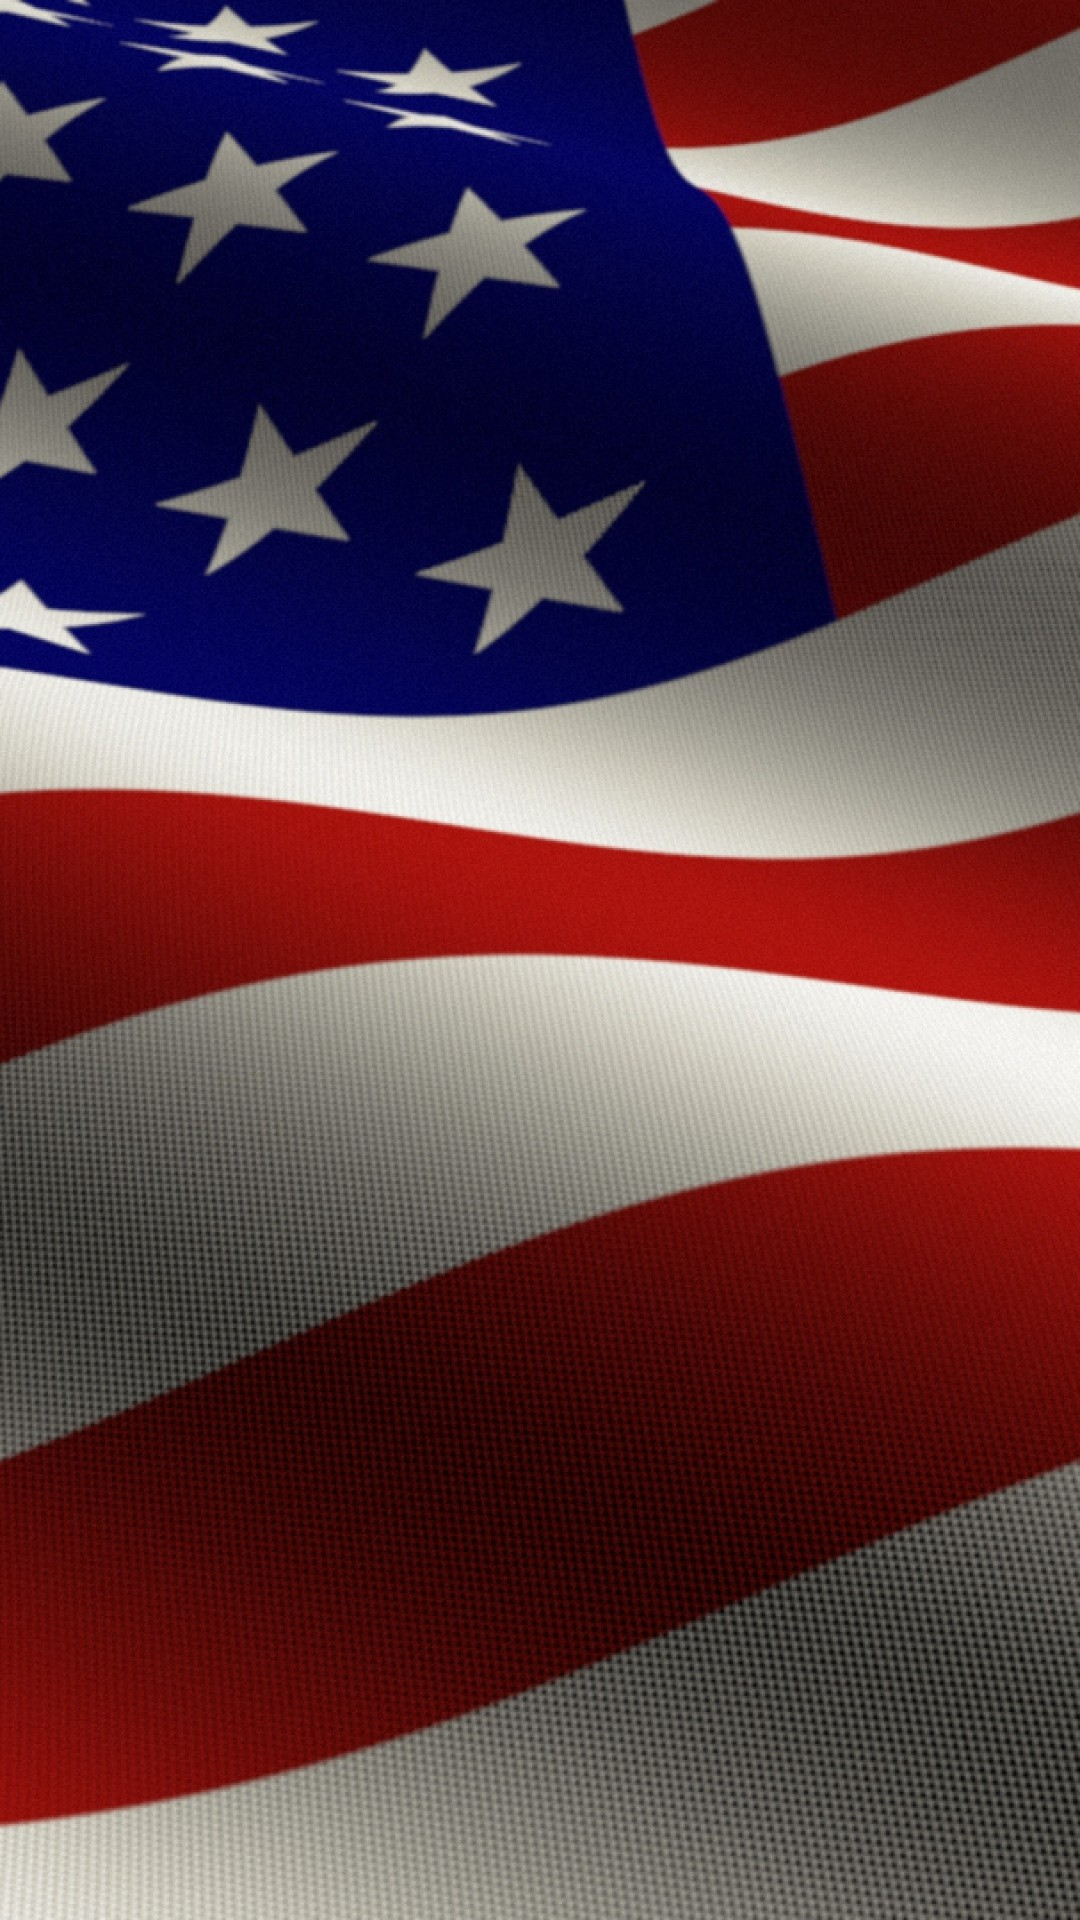 USA Wallpaper iPhone 21   amerikanische Flagge Tapete   21x21 ...